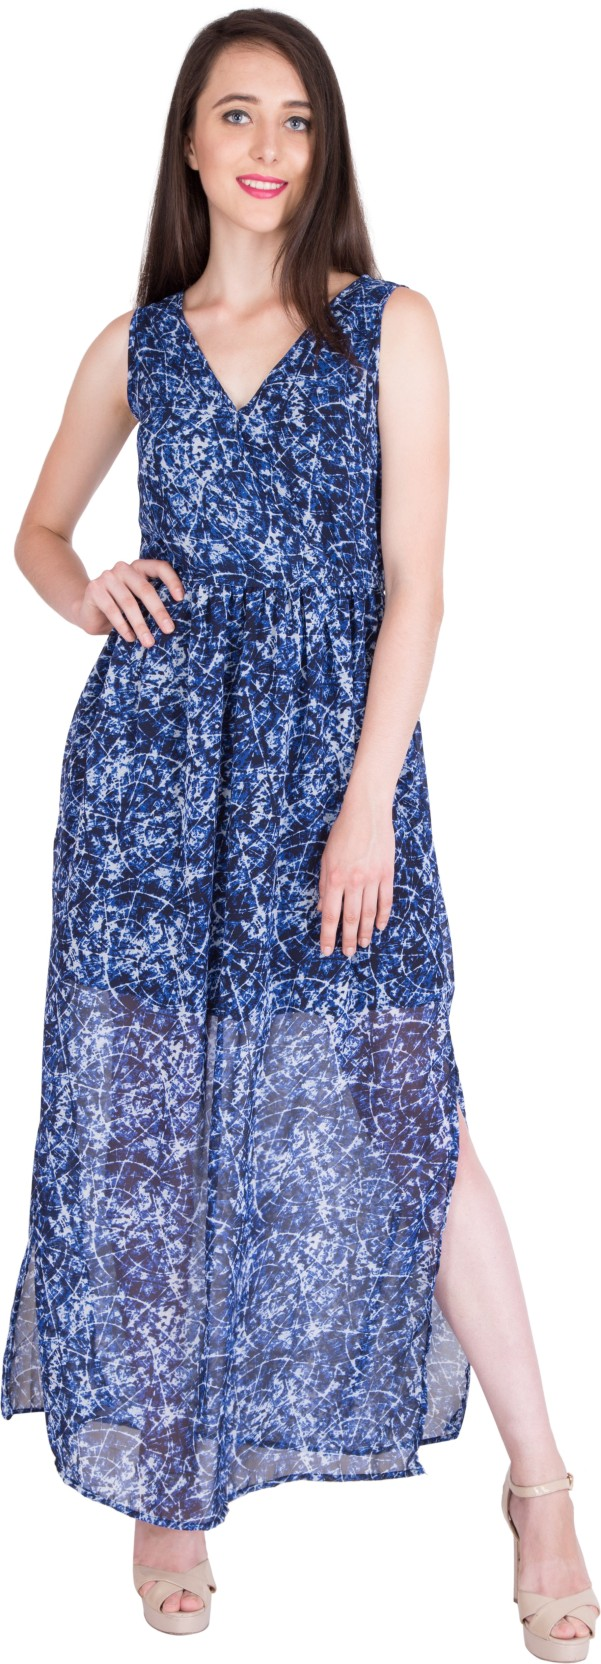 47c766087d0 Berrylush Women s Maxi Blue Dress - Buy Berrylush Women s Maxi Blue ...